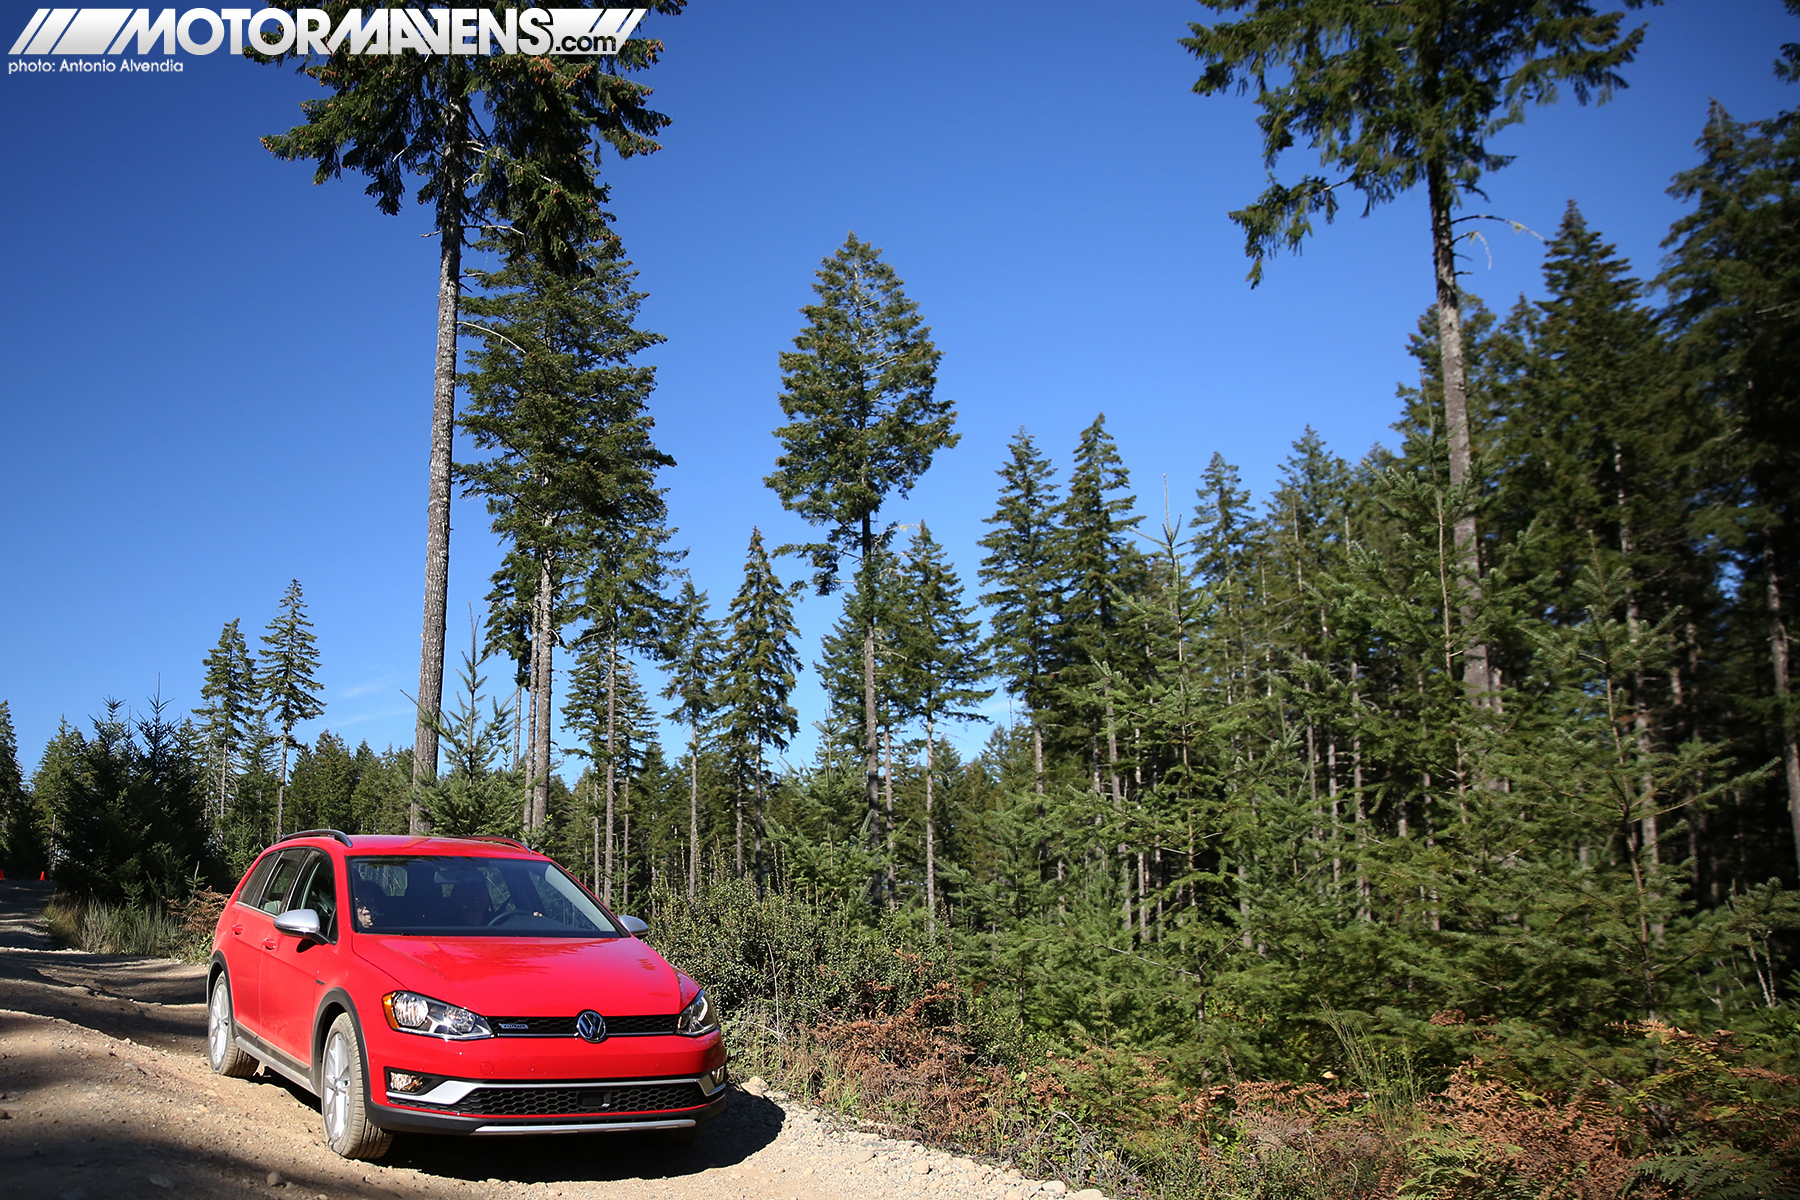 VW Golf. Golf Alltrack, Volkswagen, Sportwagen, VW, Tahuya State Forest, Elfendahl Trail, offroad